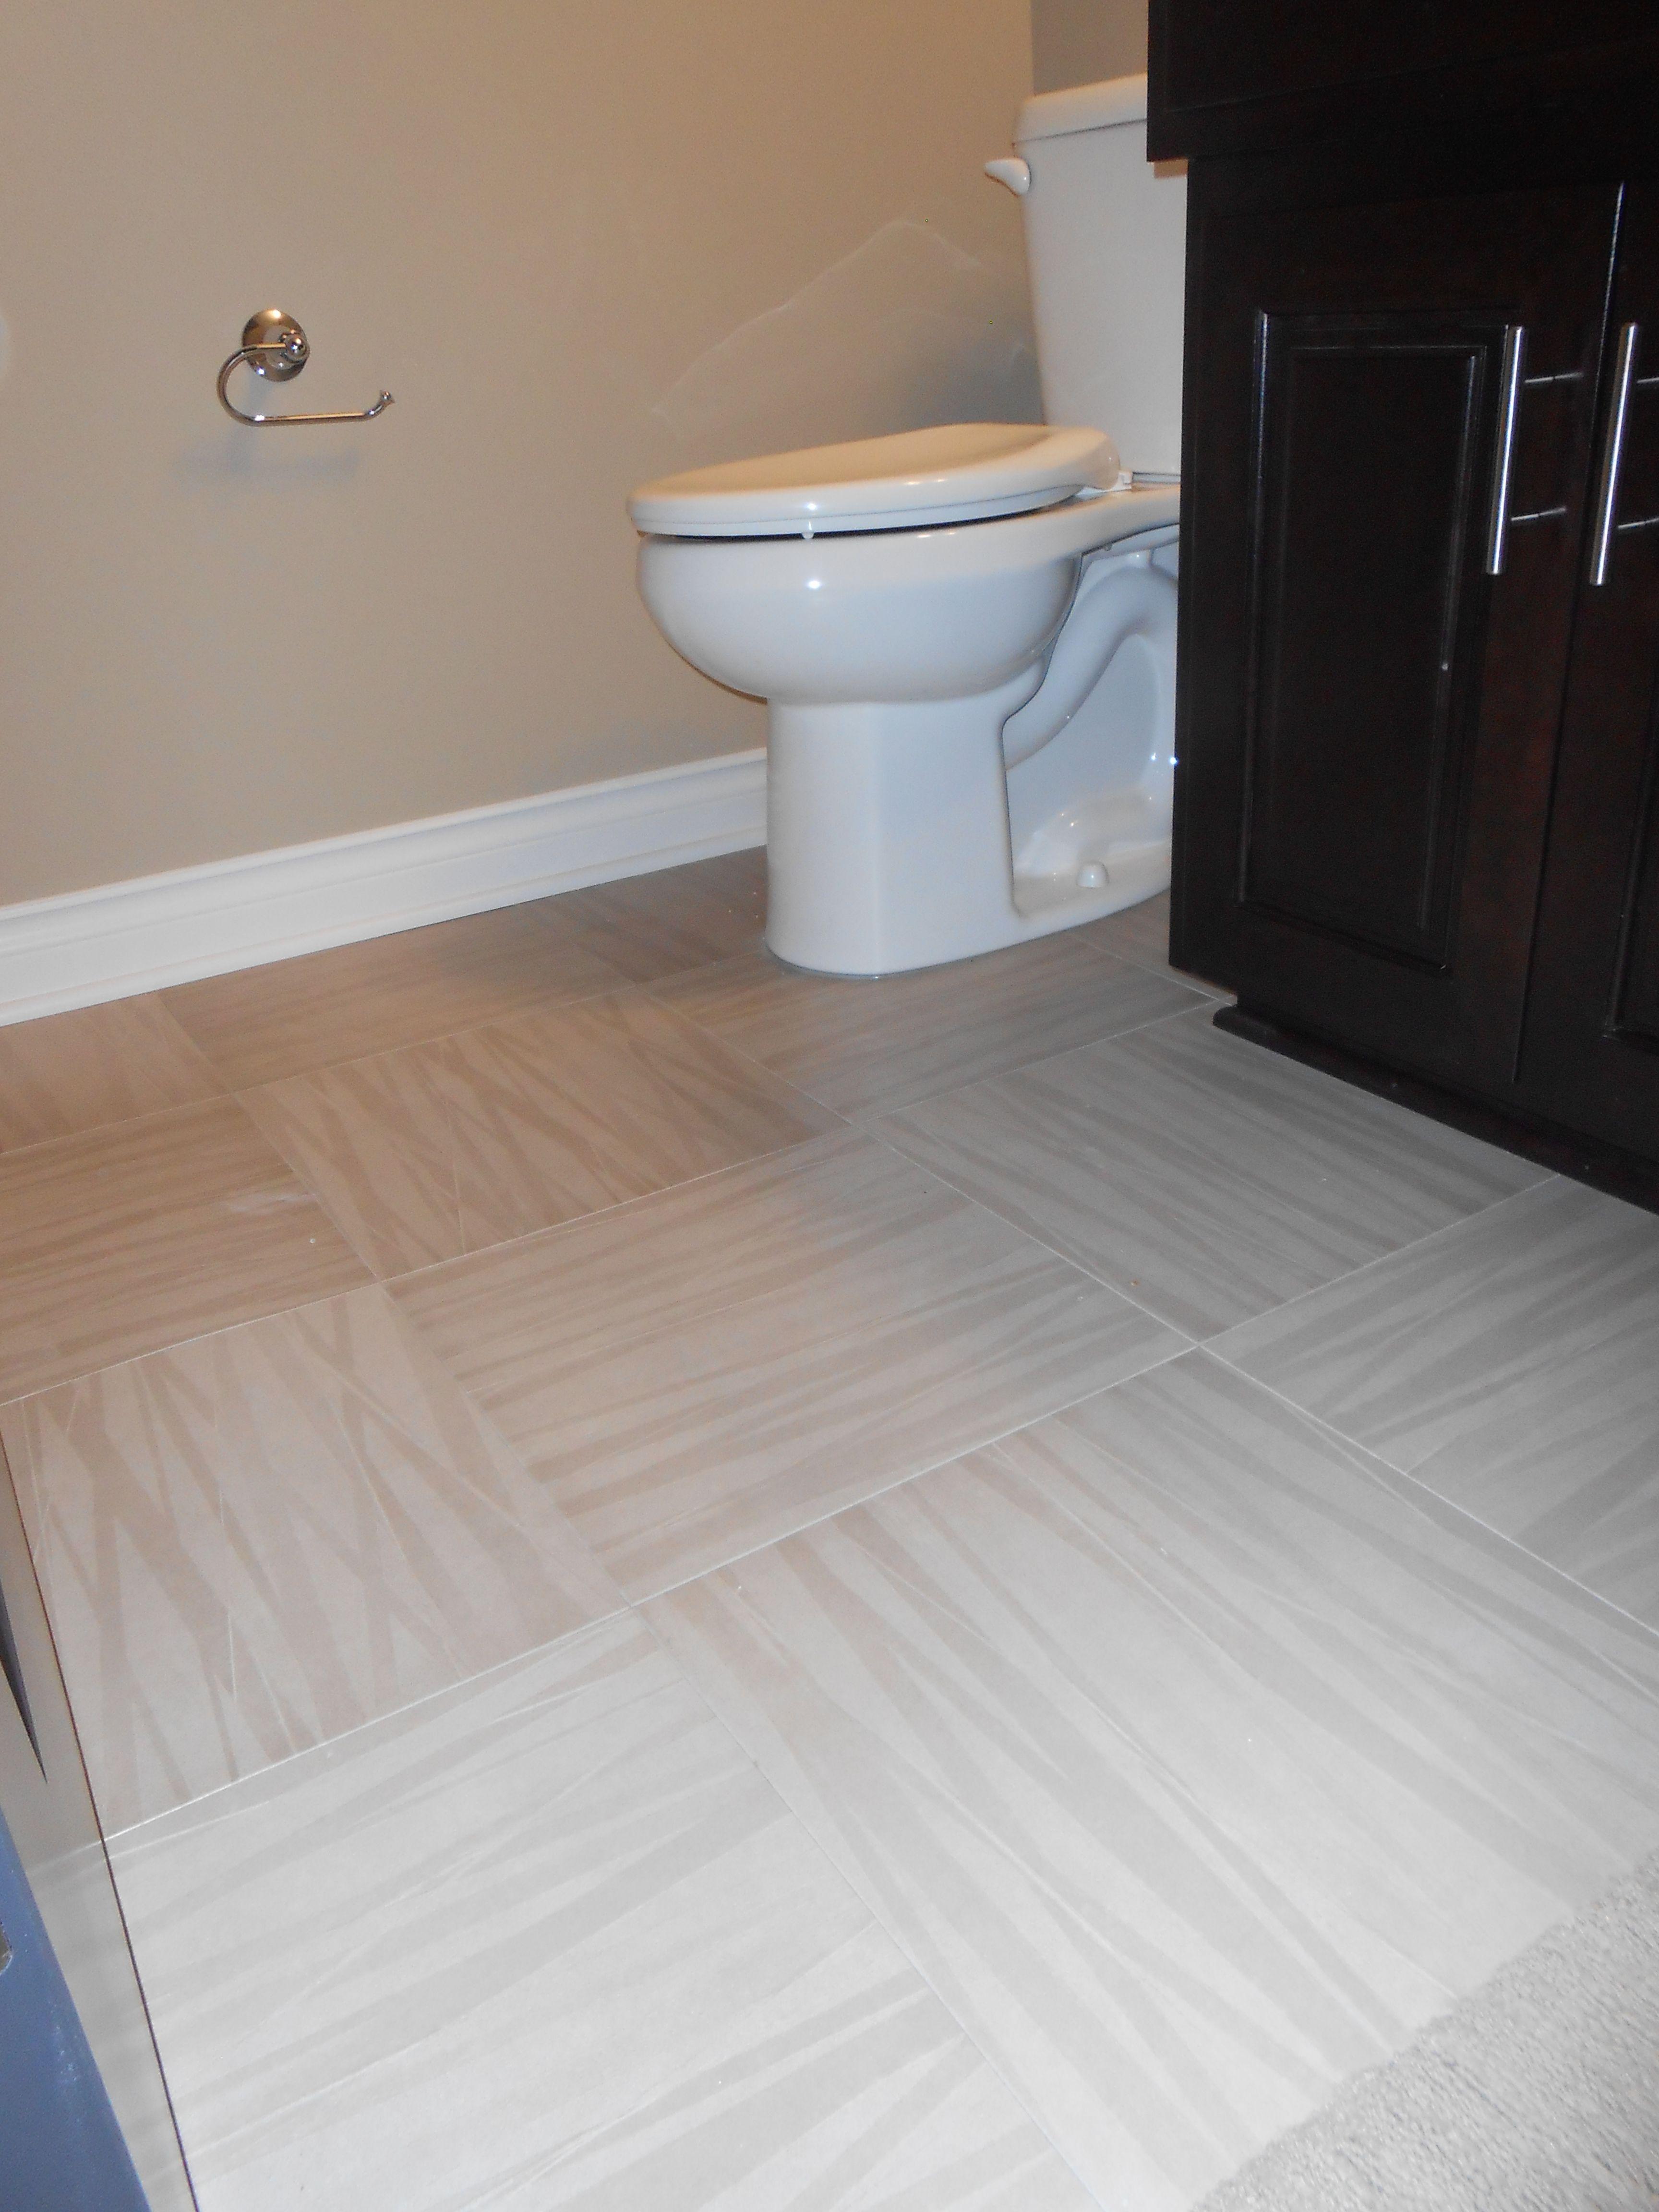 Vencil Homes Bathroom 2 Adura Luxury Vinyl Tile In The